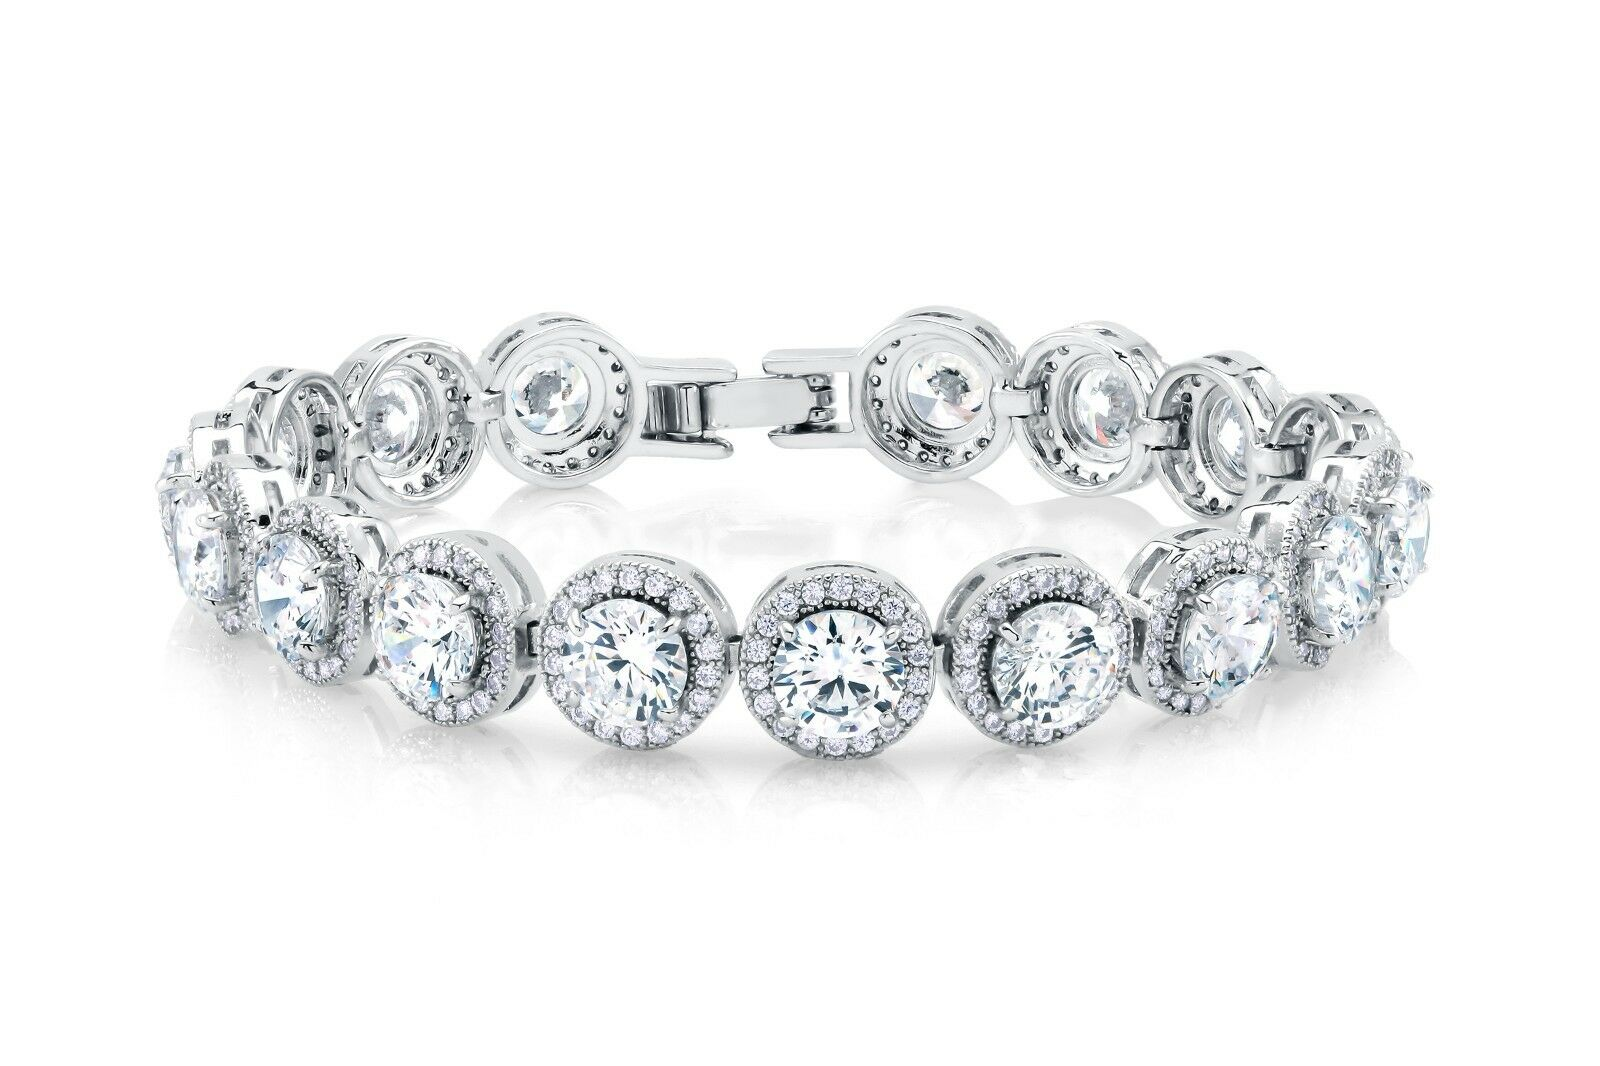 Bridal Bracelet Wedding Bracelet Bridal Jewelry Crystal Bracelet Rhinestone